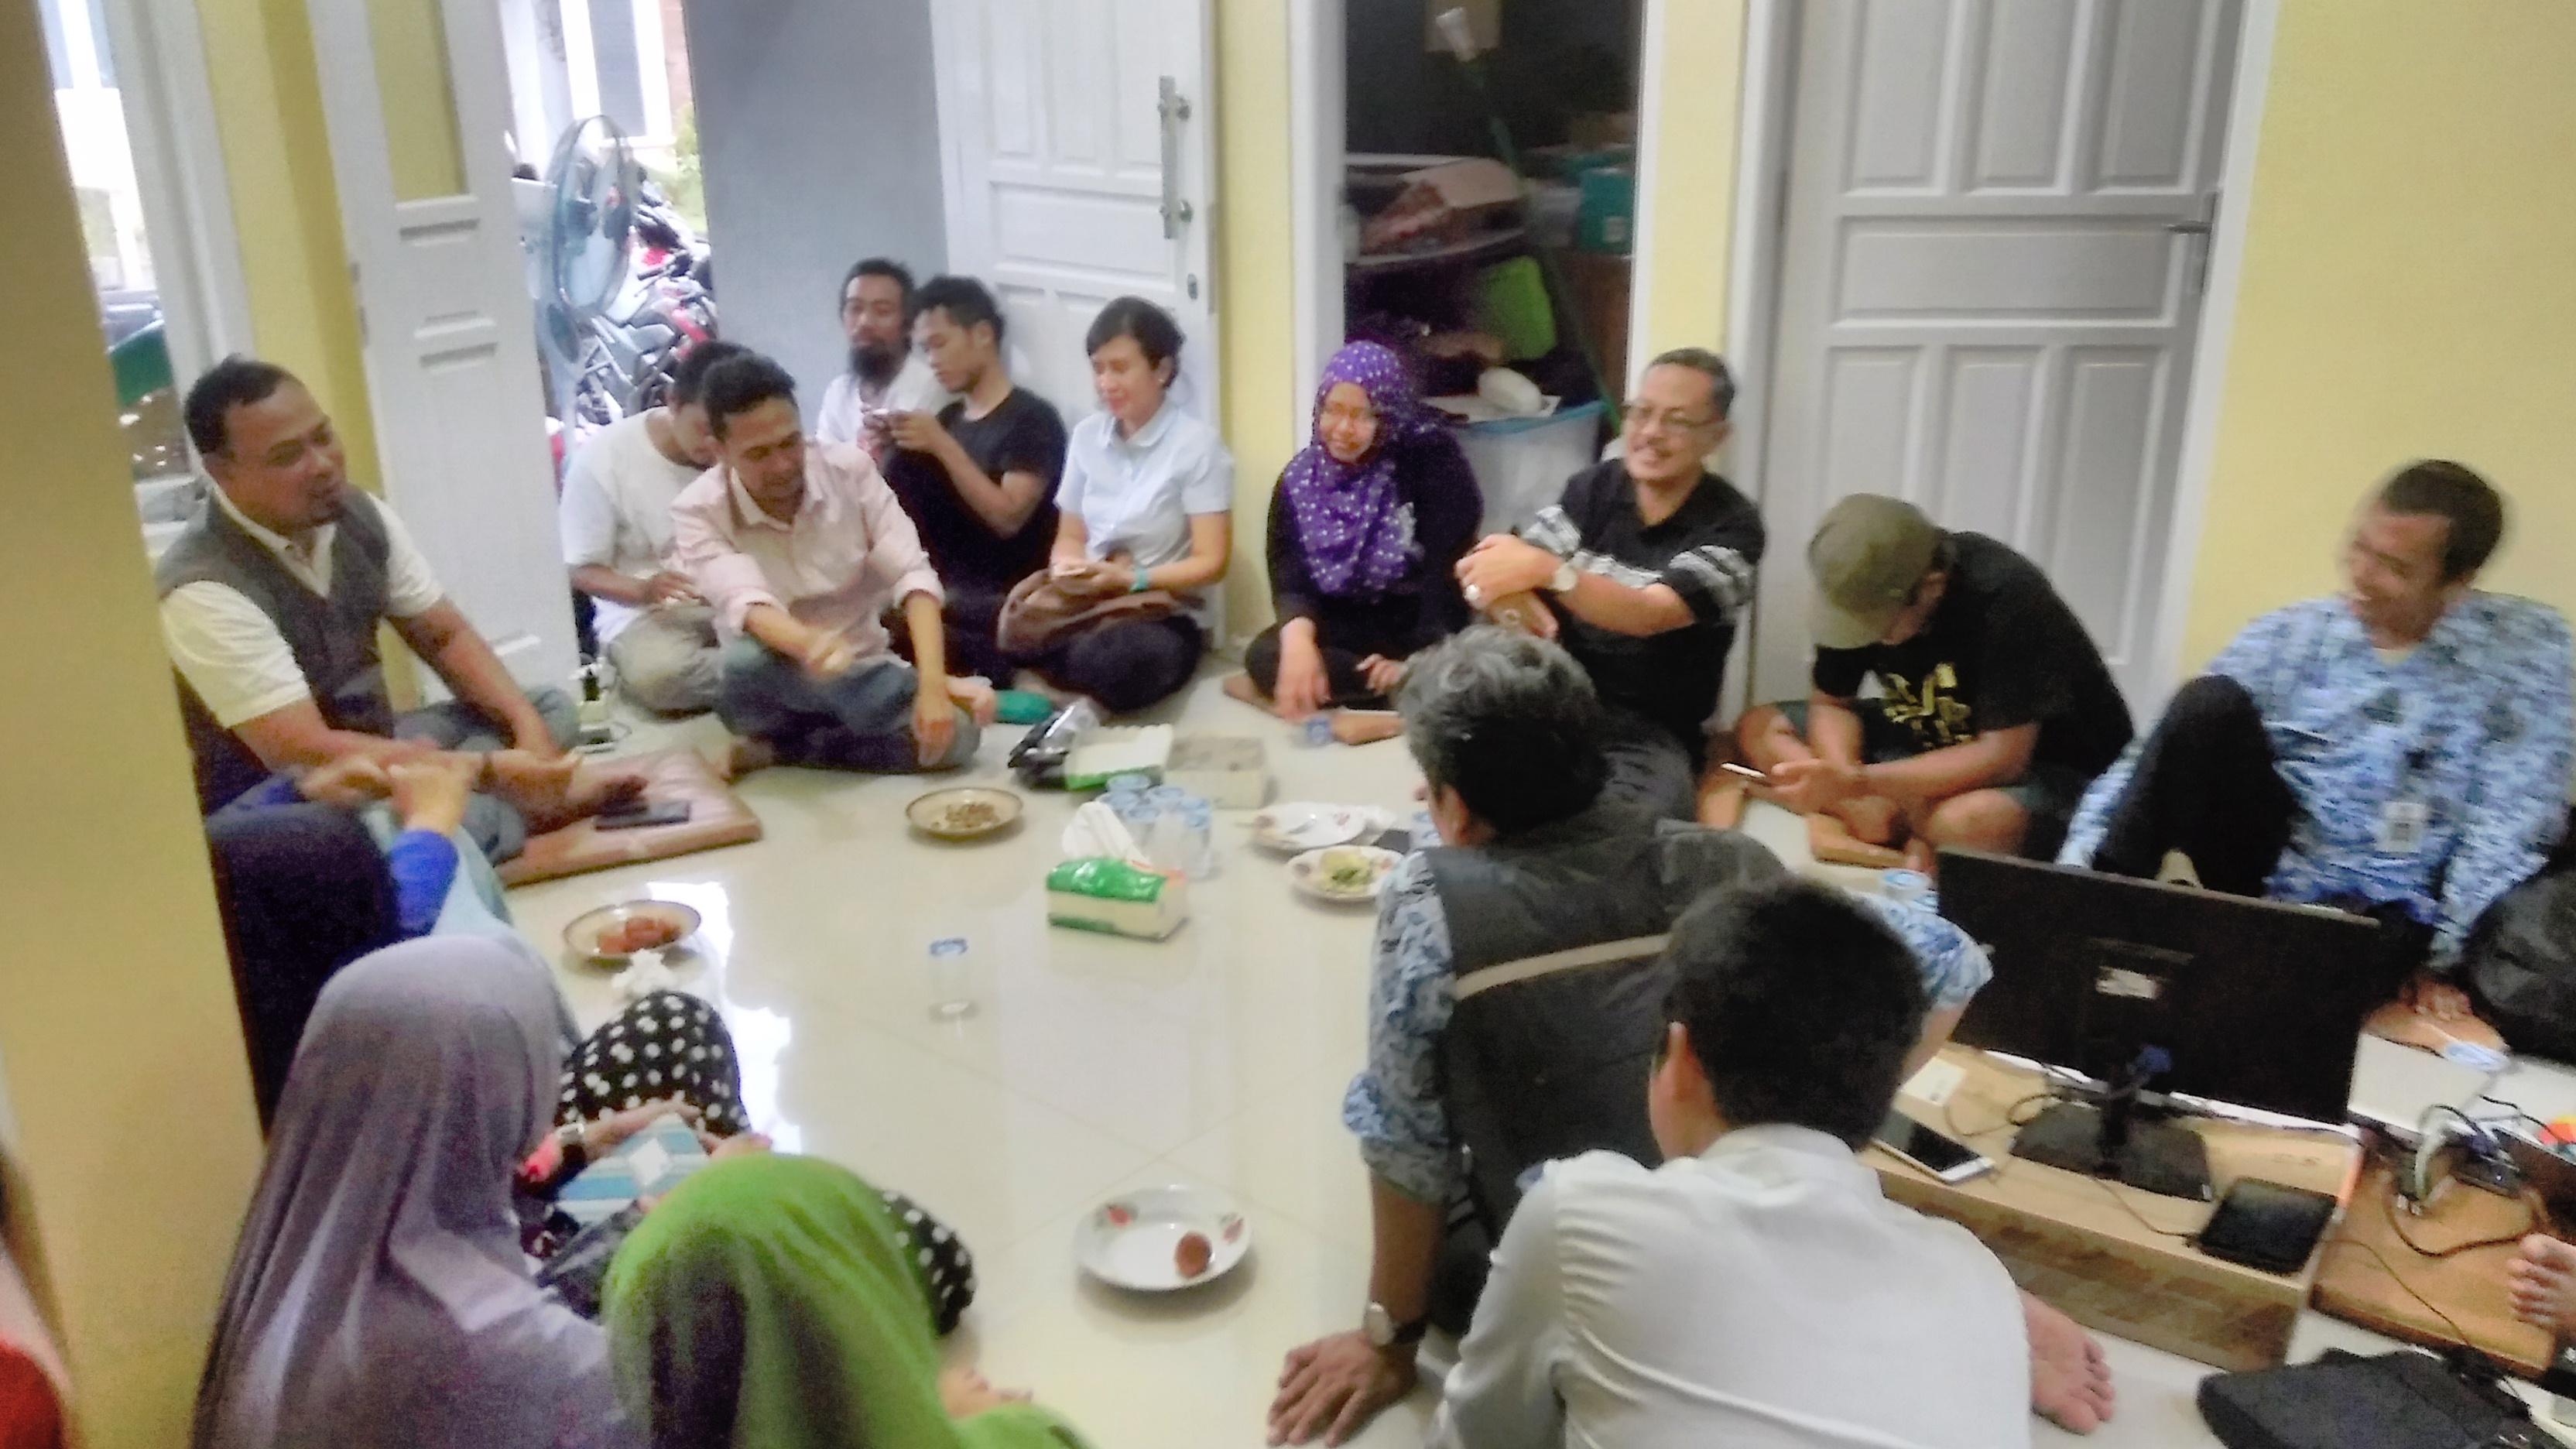 Arief Setyabudi: Kita Mewarisi Gen Orang Hebat